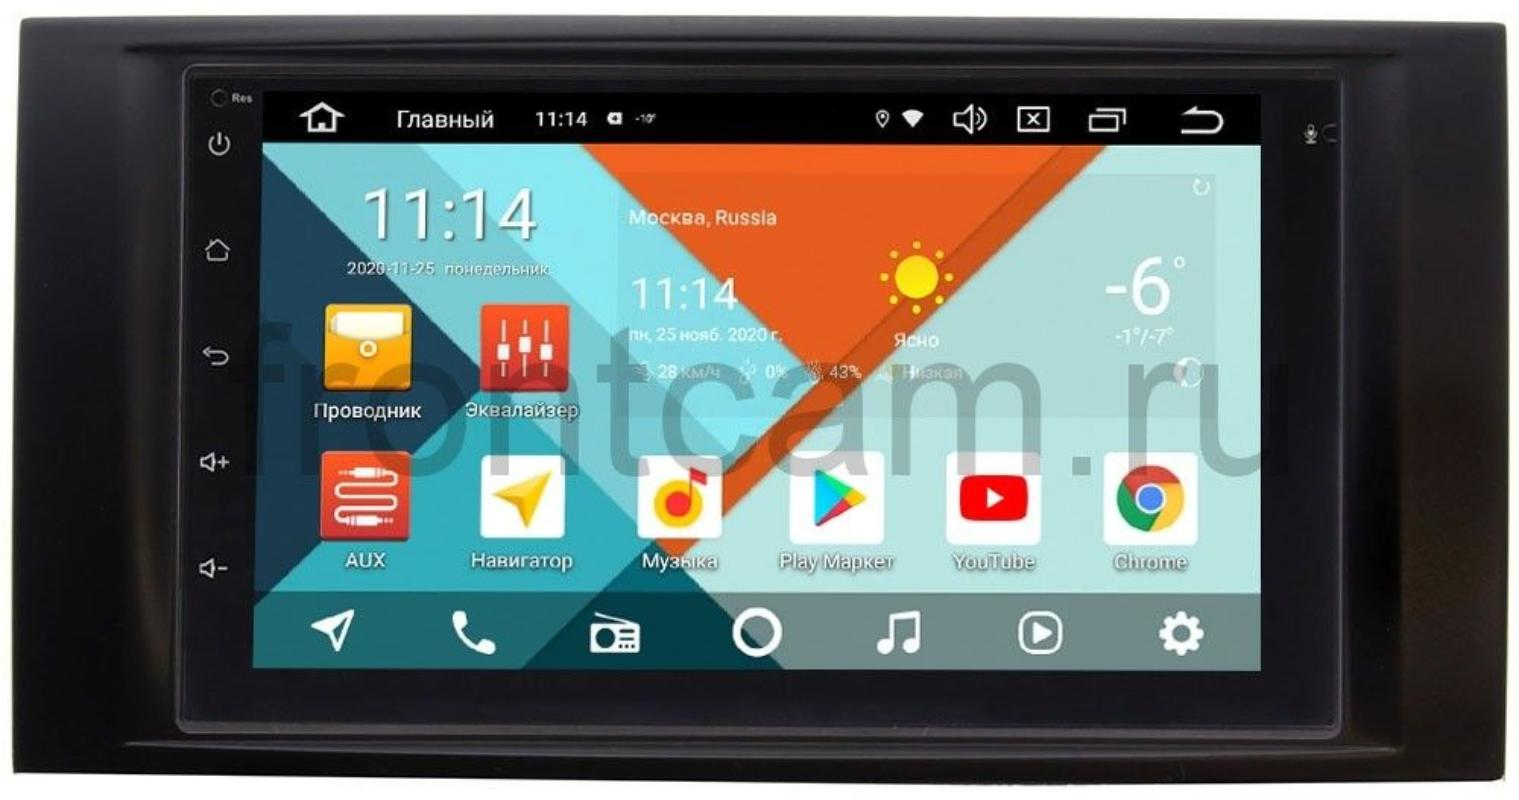 Магнитола для Volkswagen Touareg, Multivan T5 2003-2015 Wide Media KS7001QR-3/32-RP-VWTGB-135 на Android 10(DSP CarPlay 4G-SIM) (+ Камера заднего вида в подарок!)